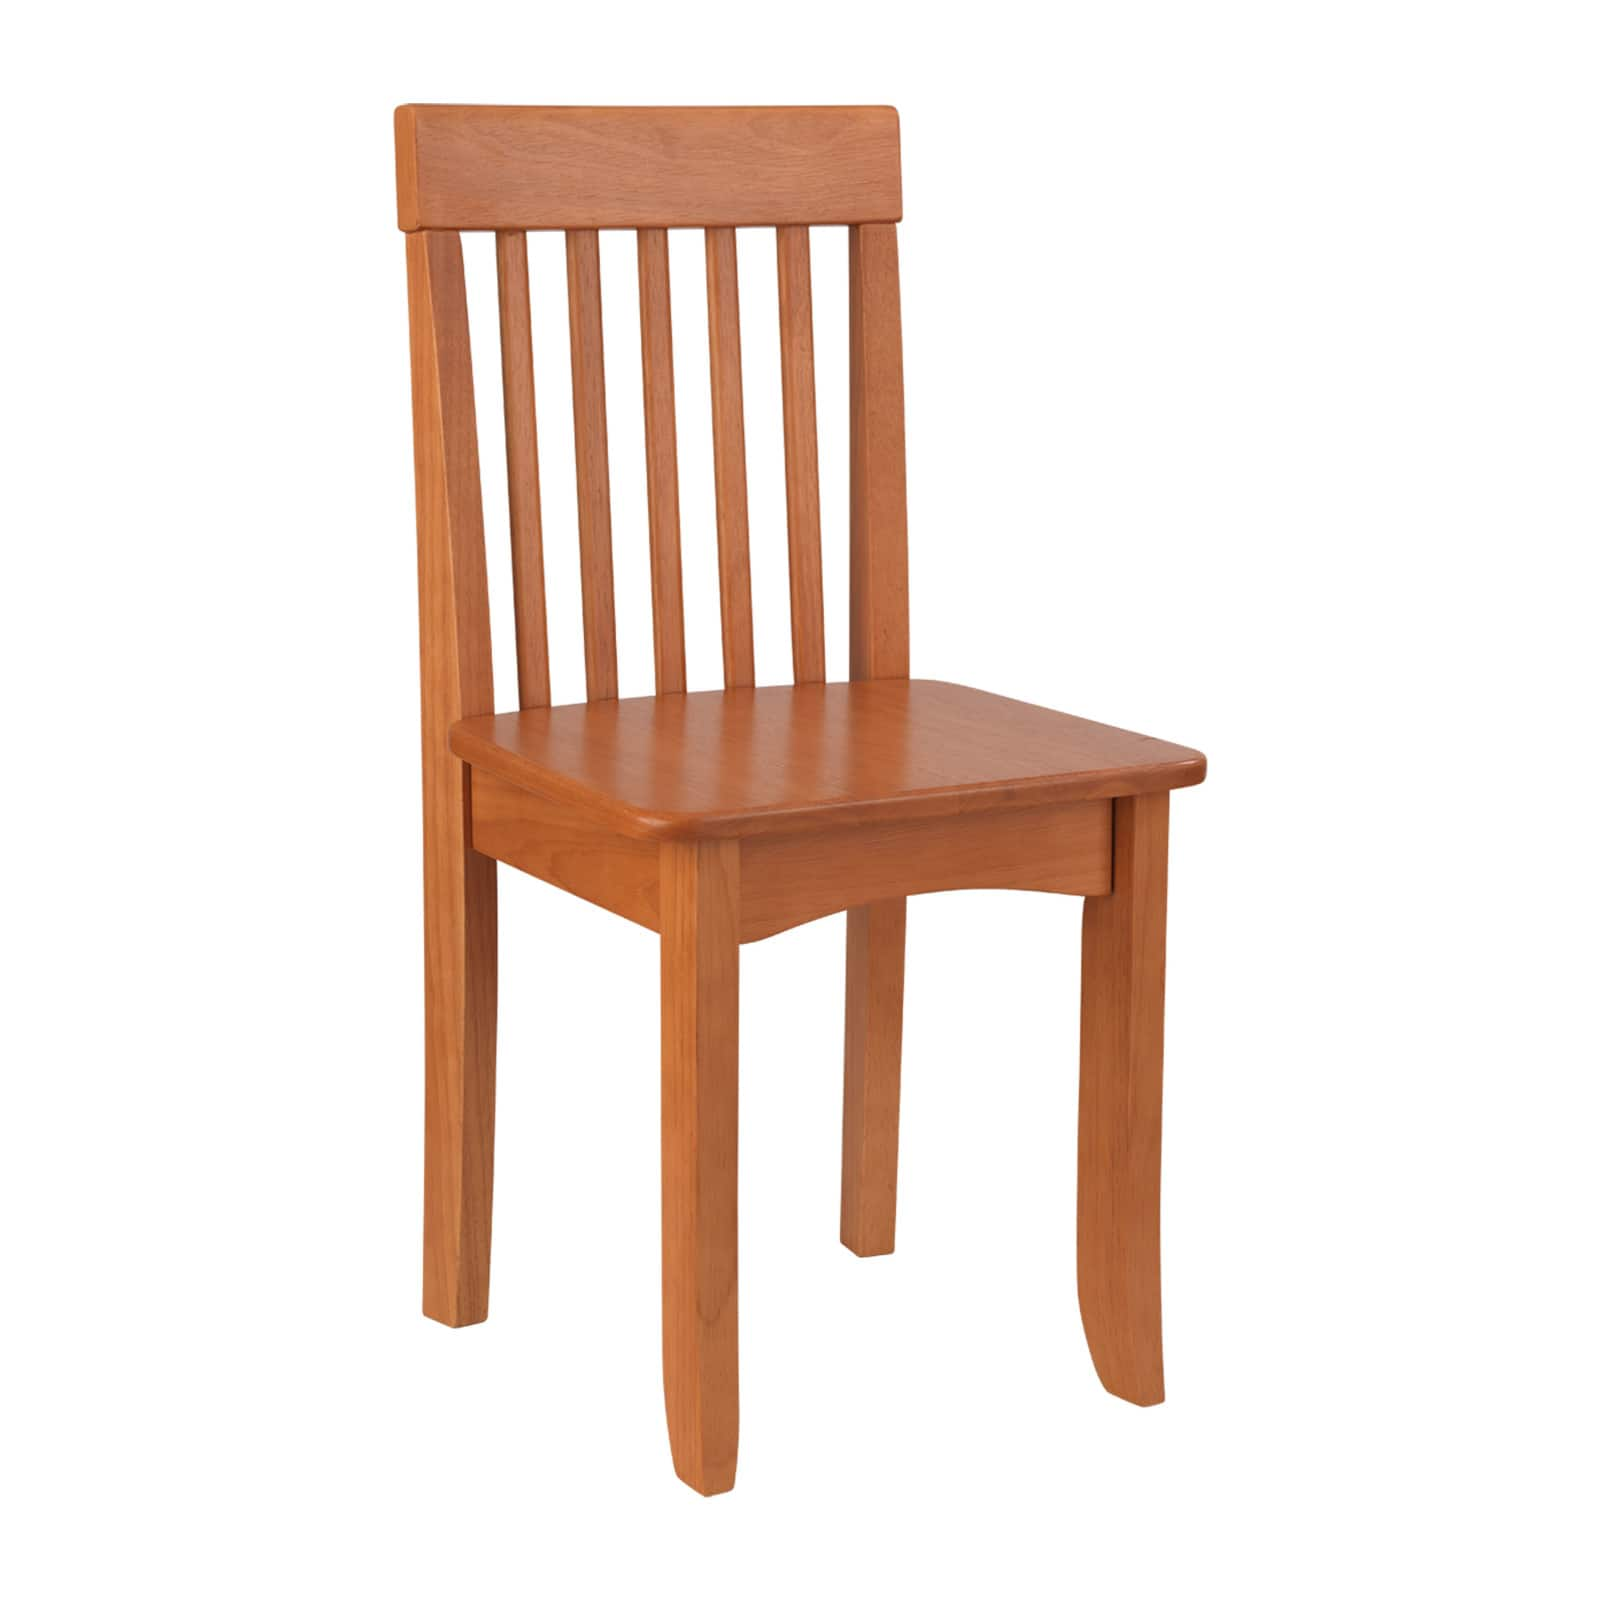 kidkraft avalon chair design turkey